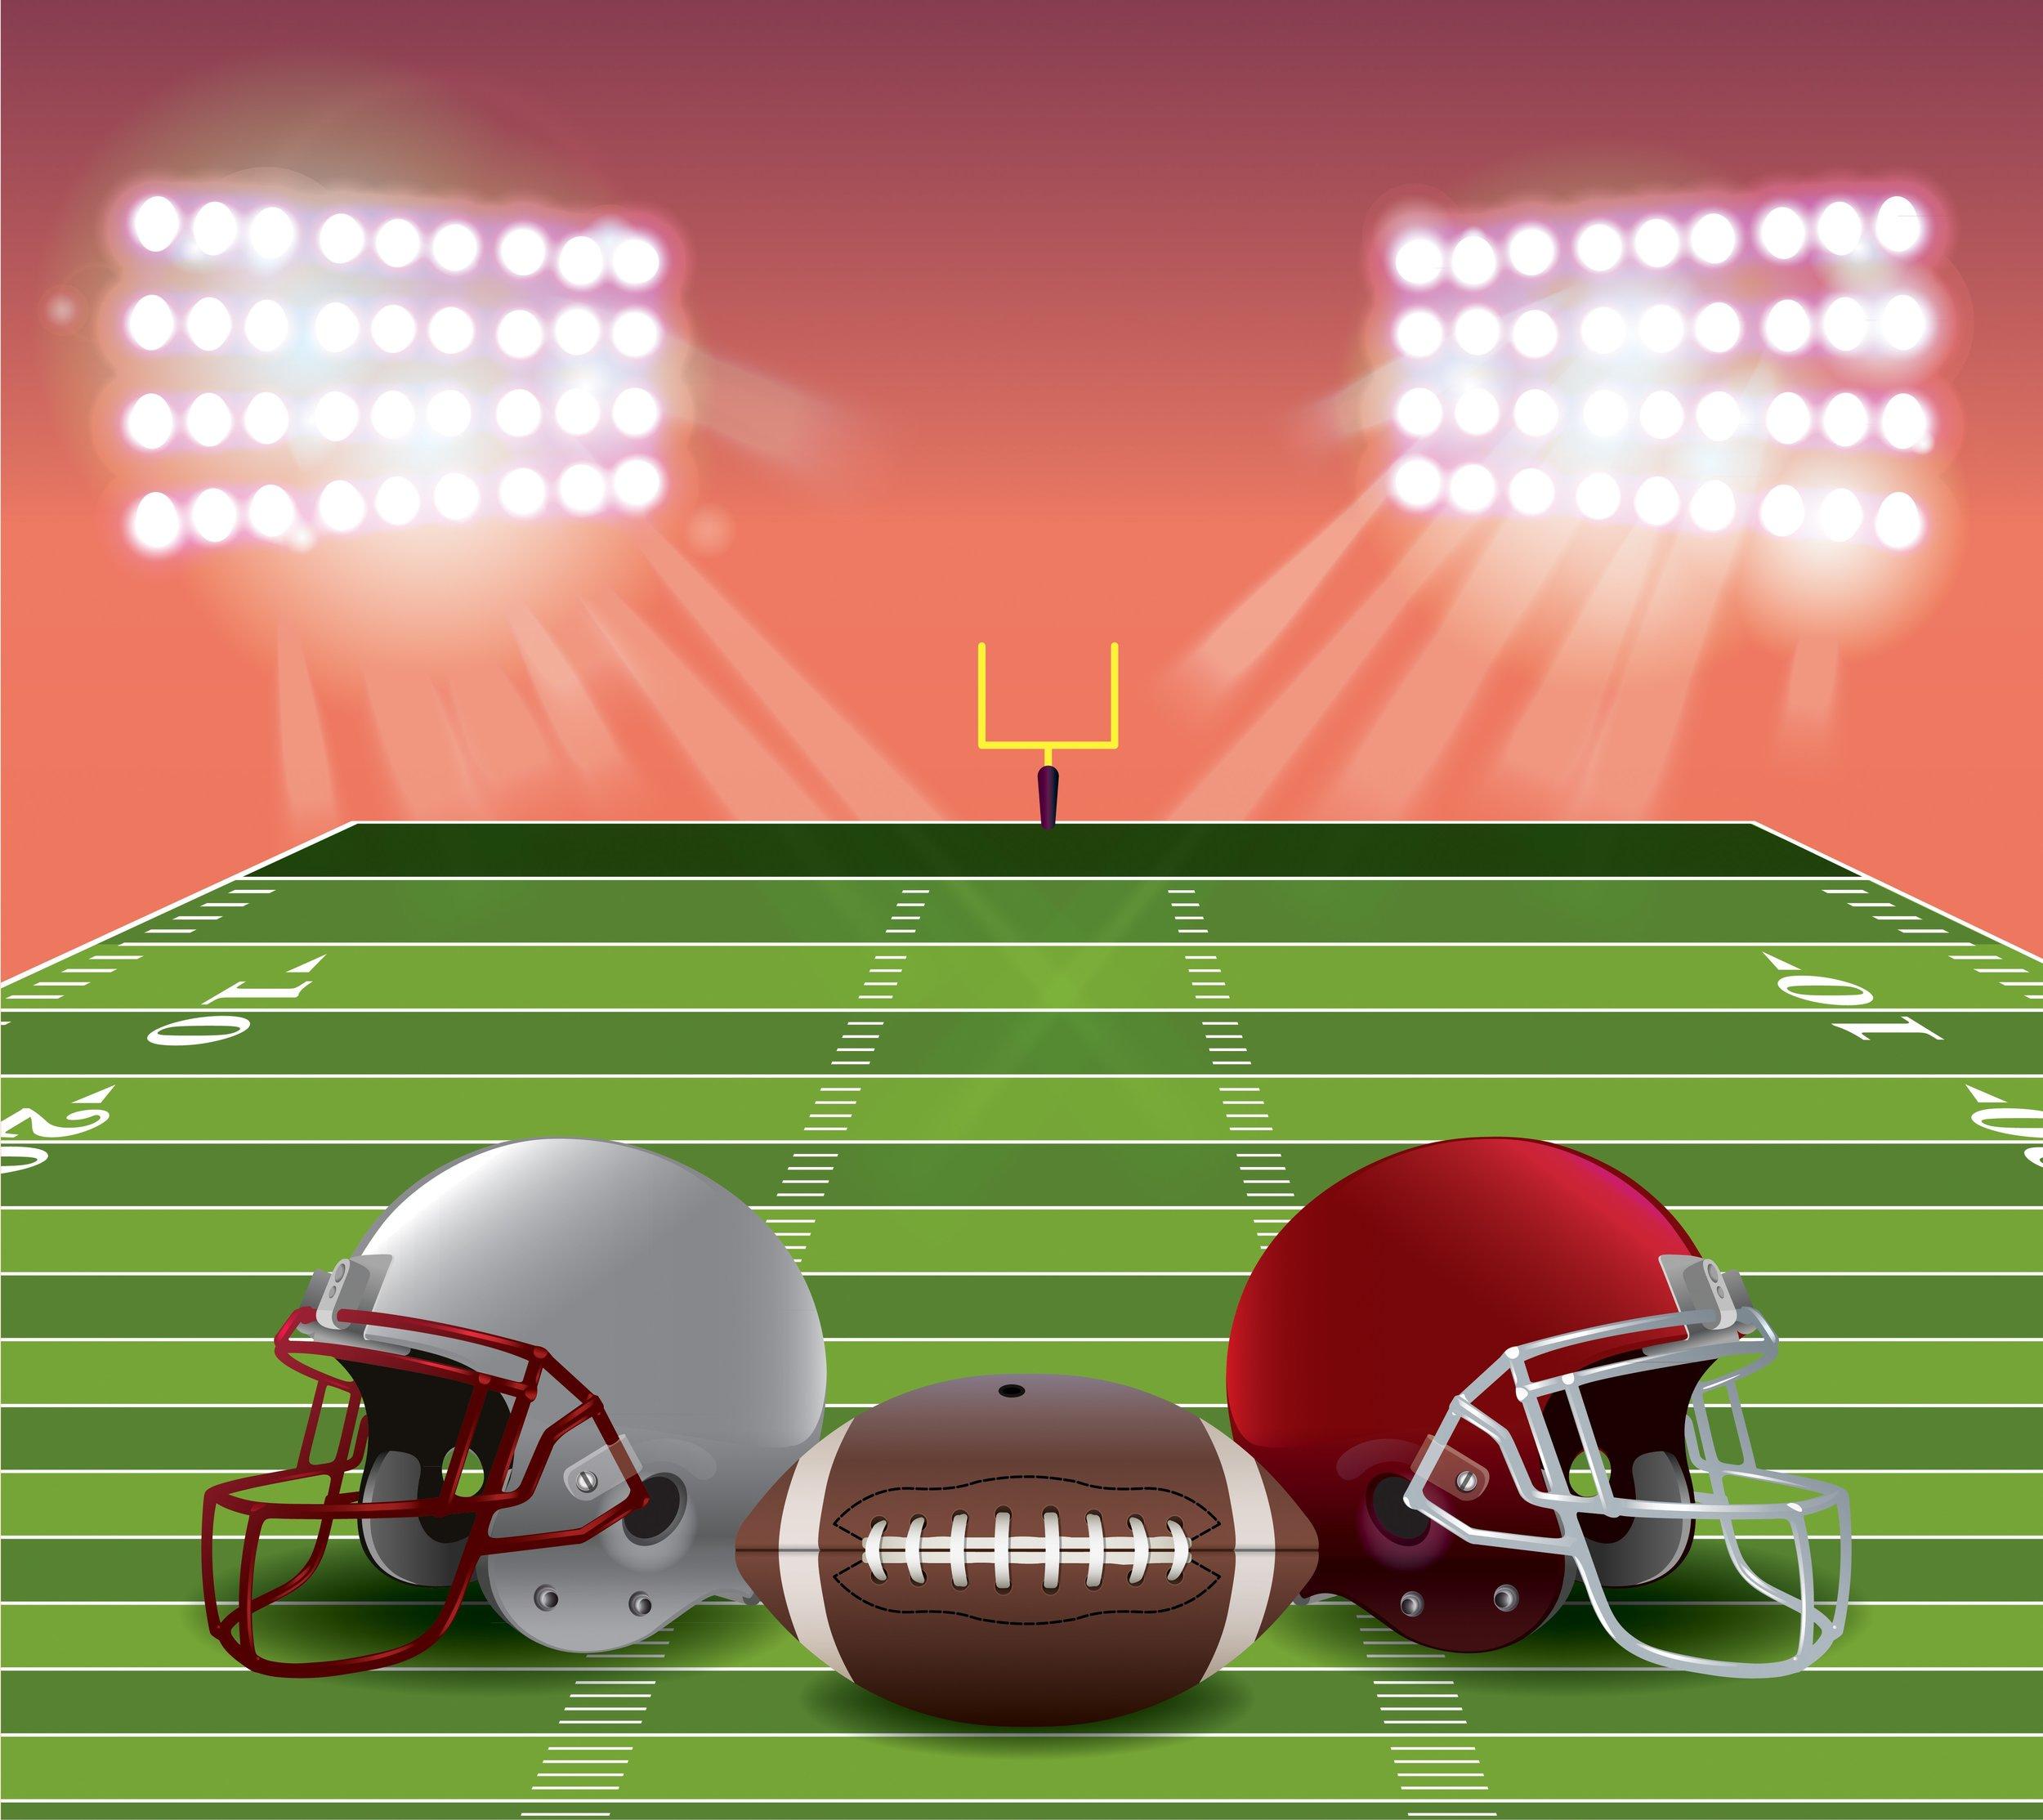 Digital graphic of football helmets and football on a football field with stadium lights